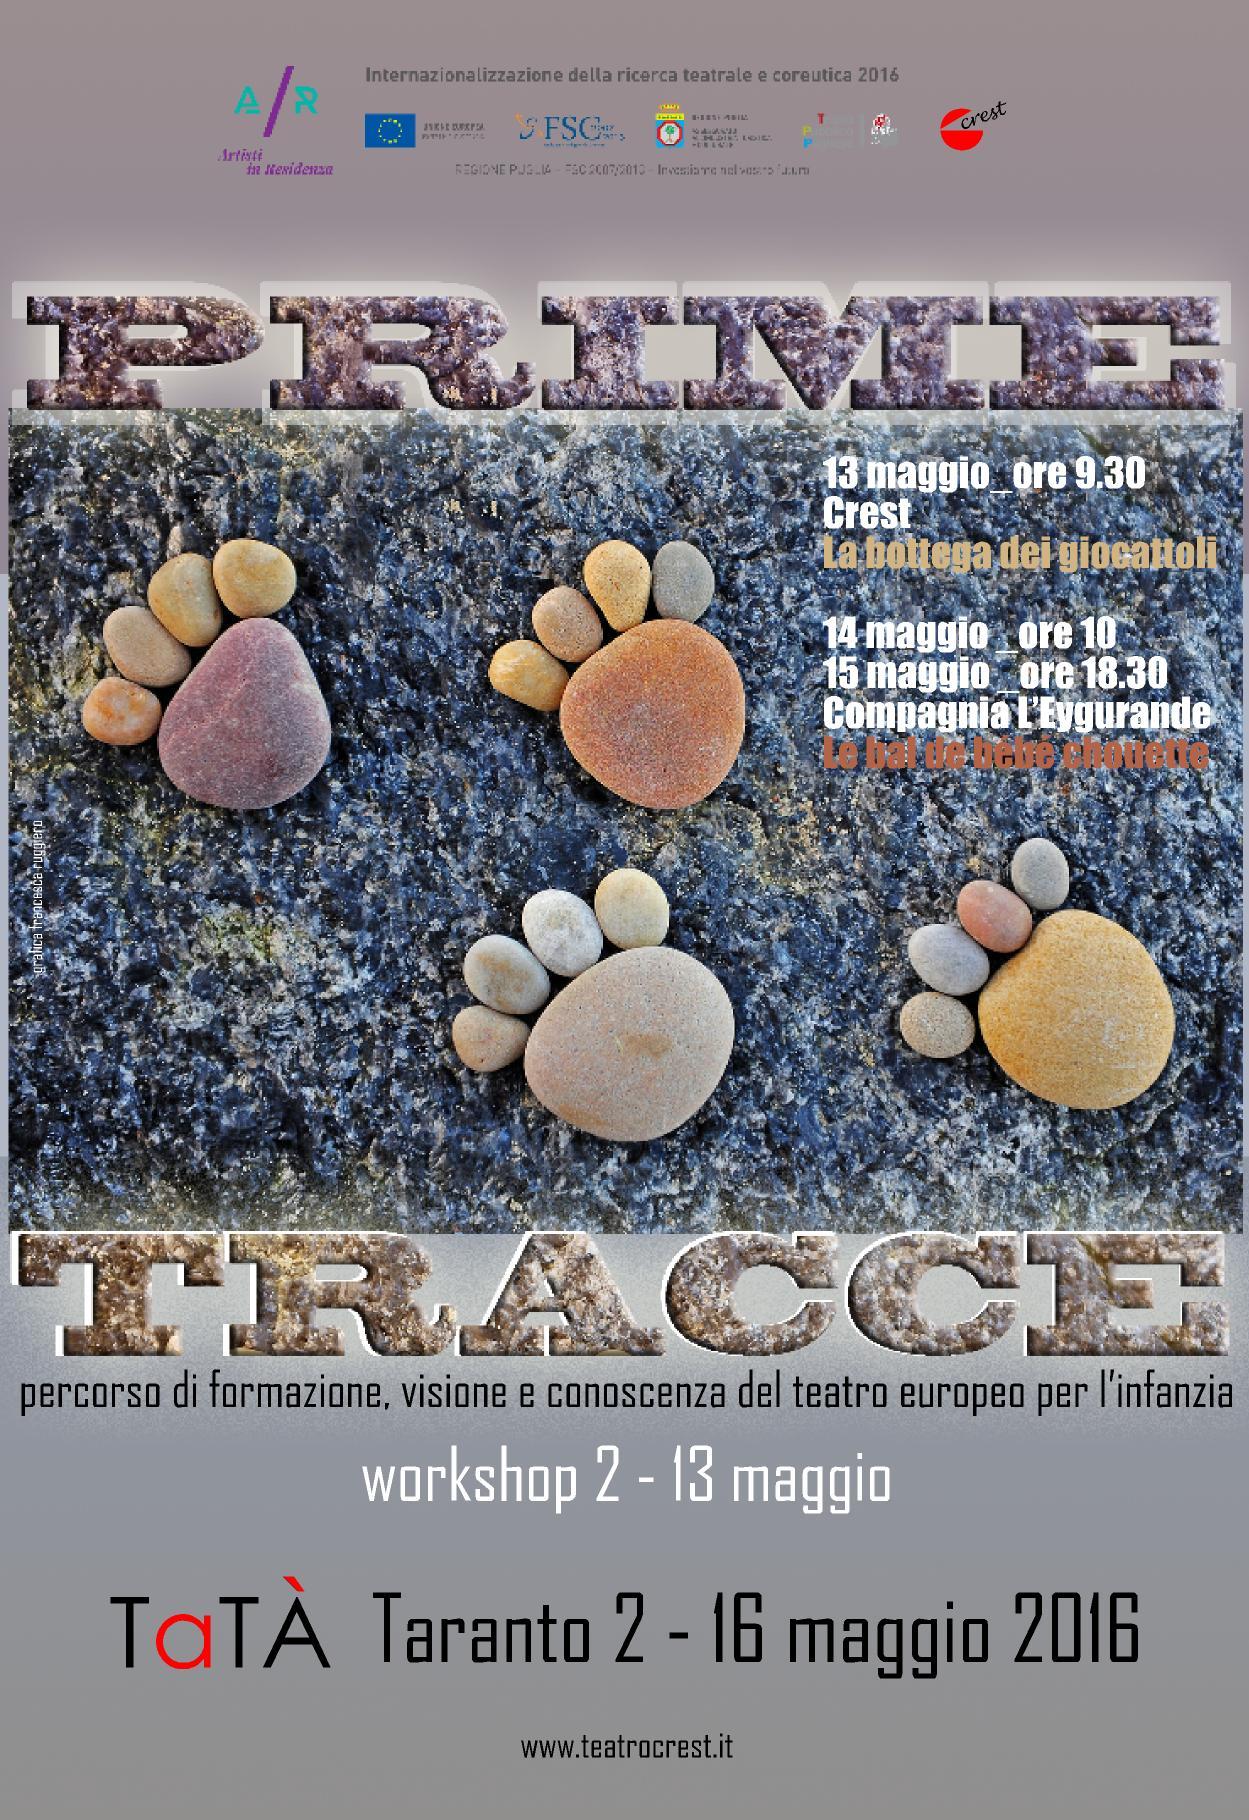 Teatro europeo per l'infanzia a Taranto